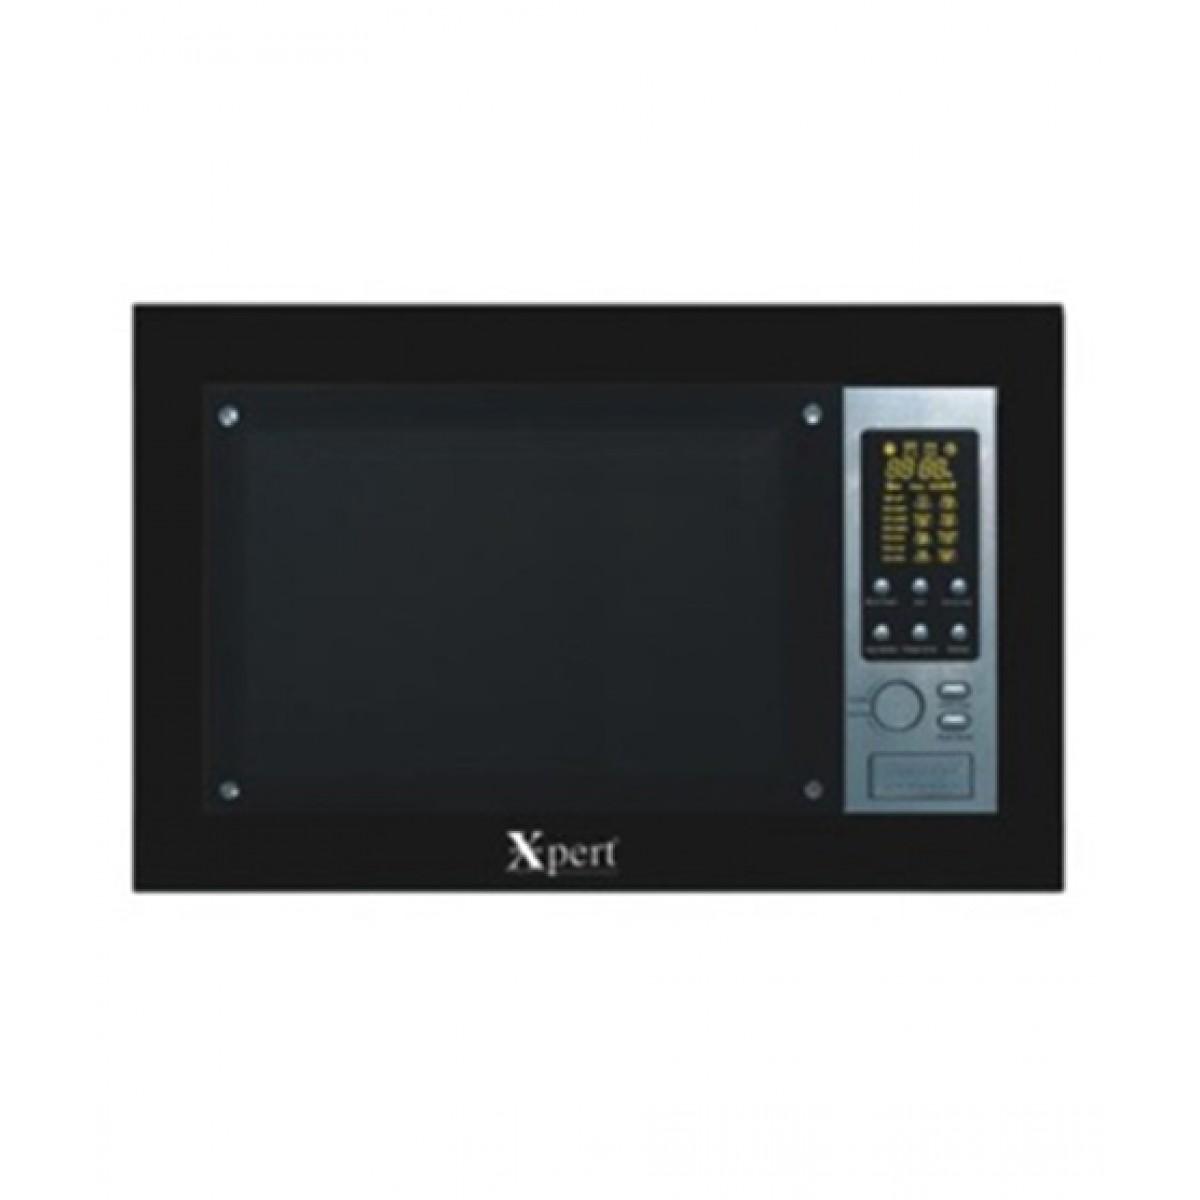 Xpert Microwave Oven Xug 17 B Price In Pakistan Buy